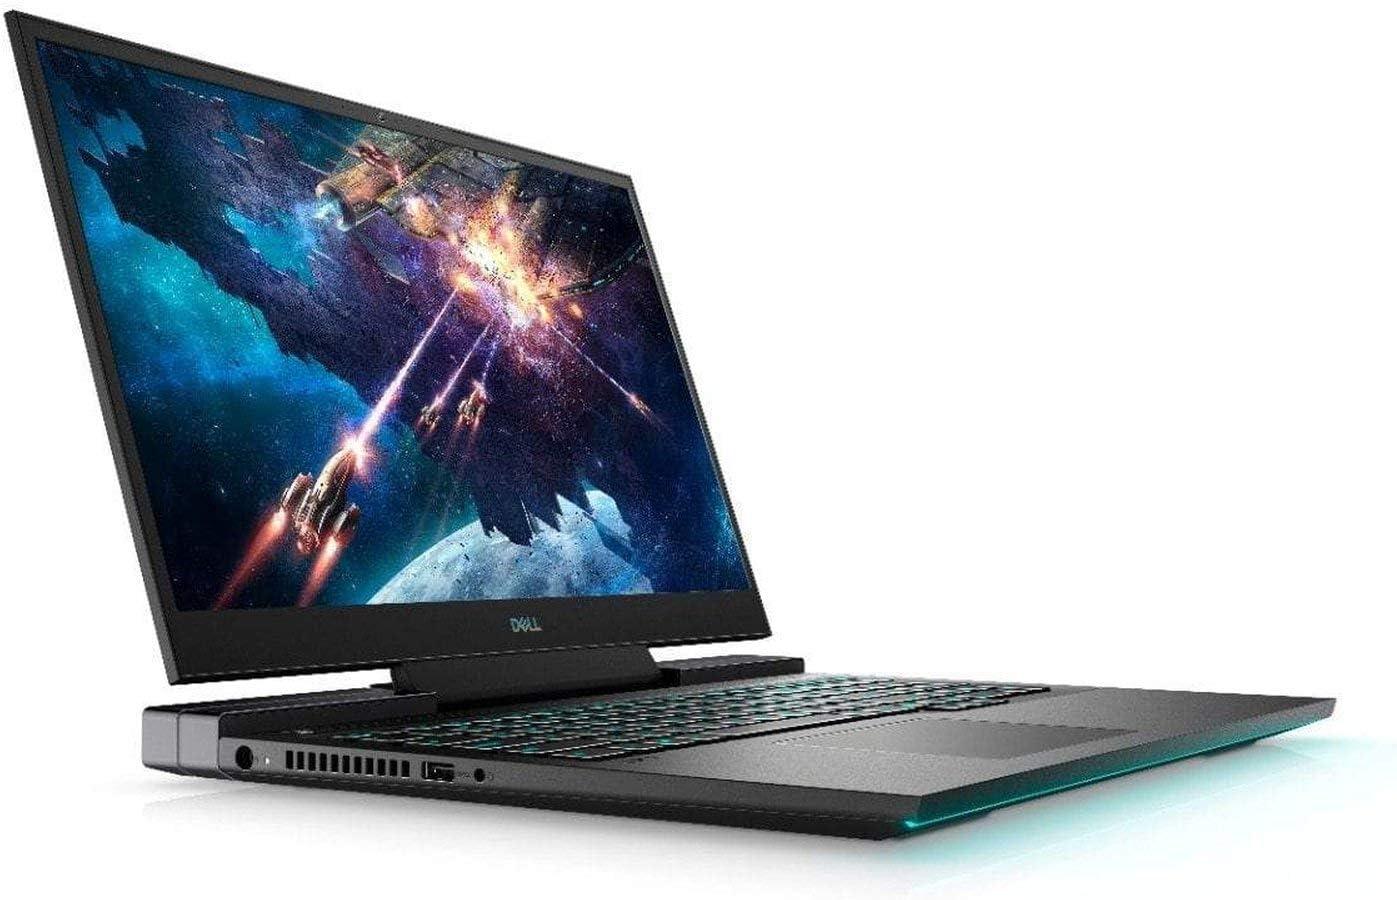 Dell G7 7700 Laptop 17.3 - Intel Core i7 10th Gen - i7-10750H - Six Core 5Ghz - 1TB SSD - 32GB RAM - 1920x1080 FHD - Windows 10 Home (Renewed)